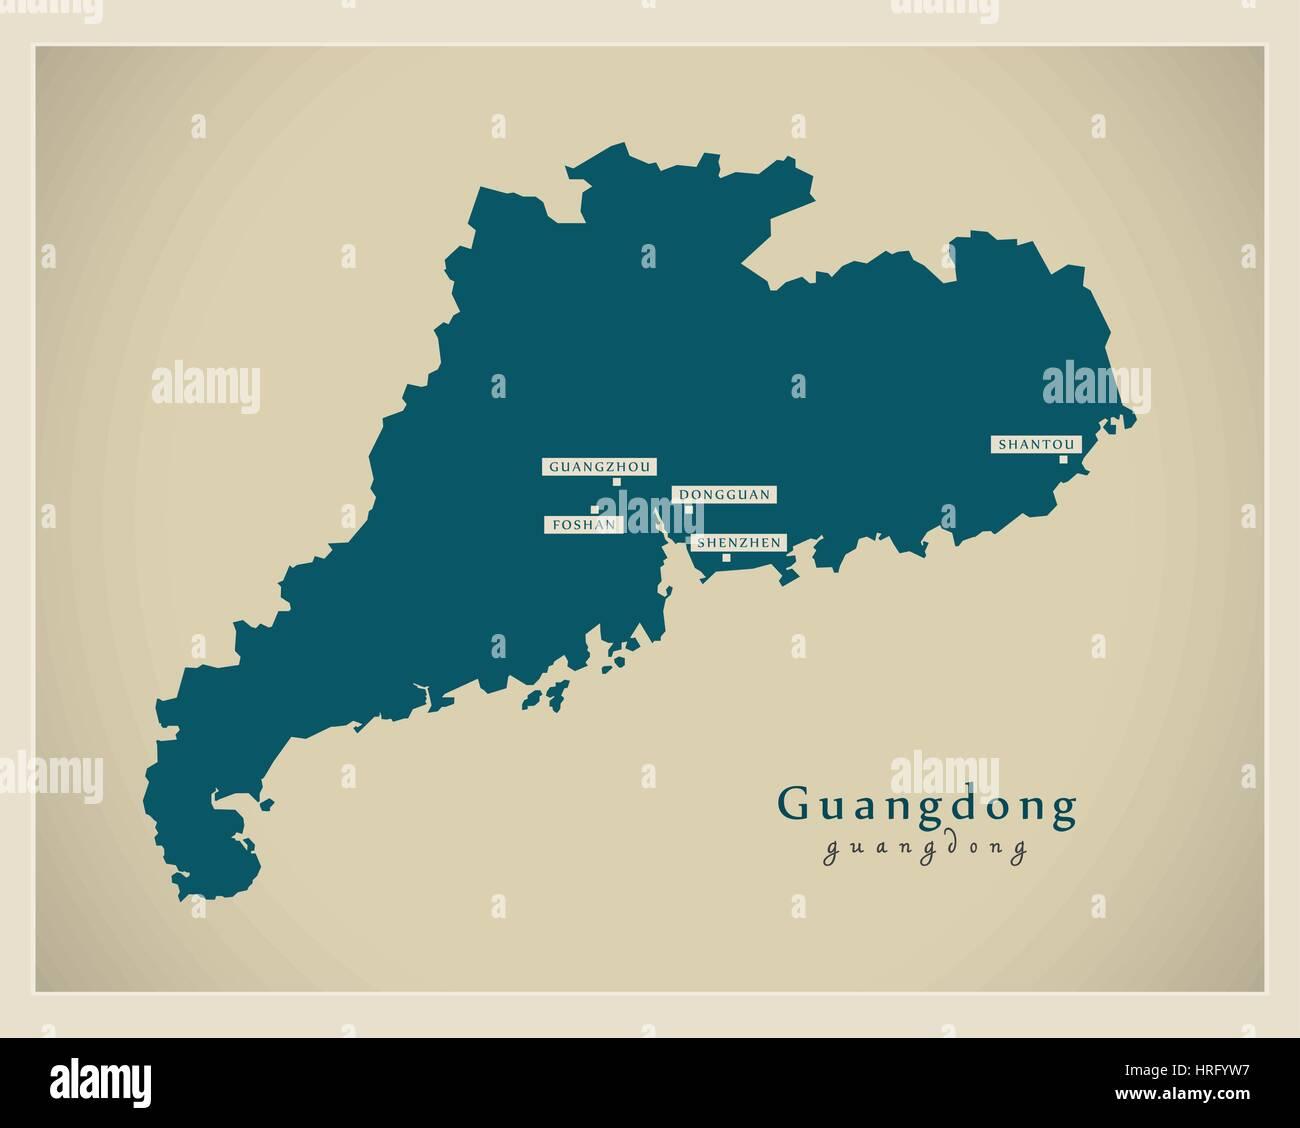 Modern Map - Guangdong - Stock Image